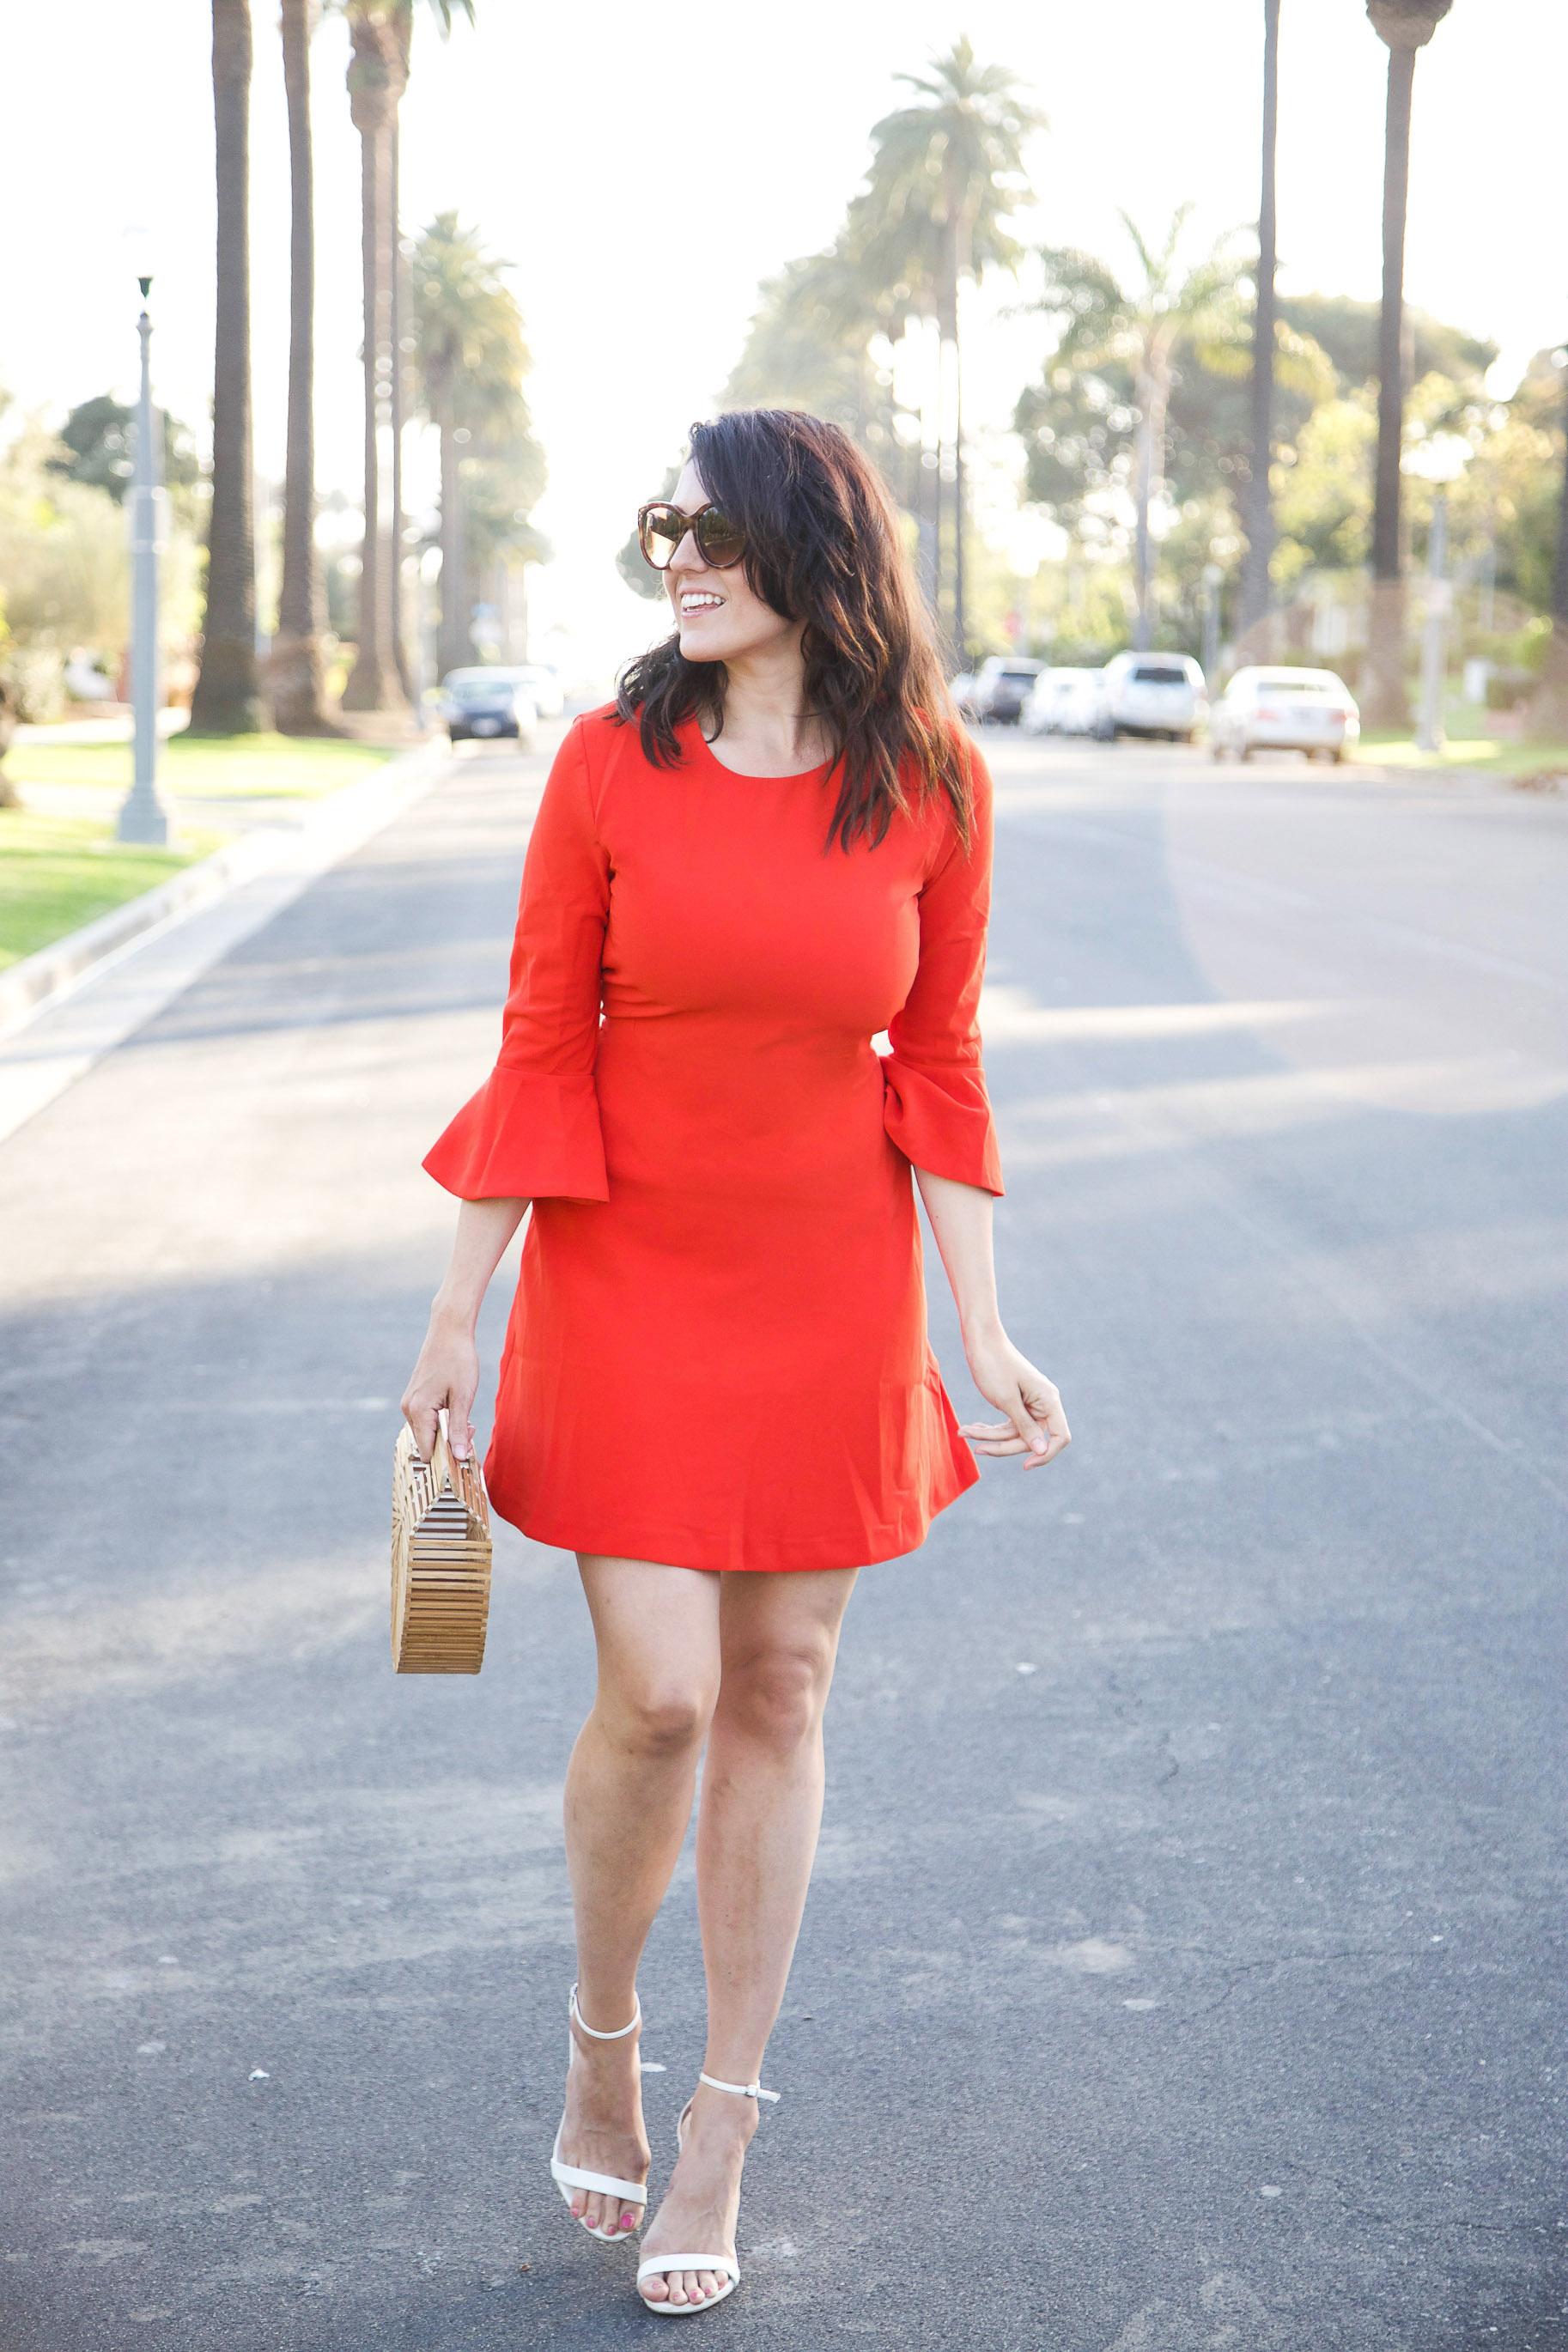 Lucy-Paris-Red-Bell-Sleeved-Dress10.jpg